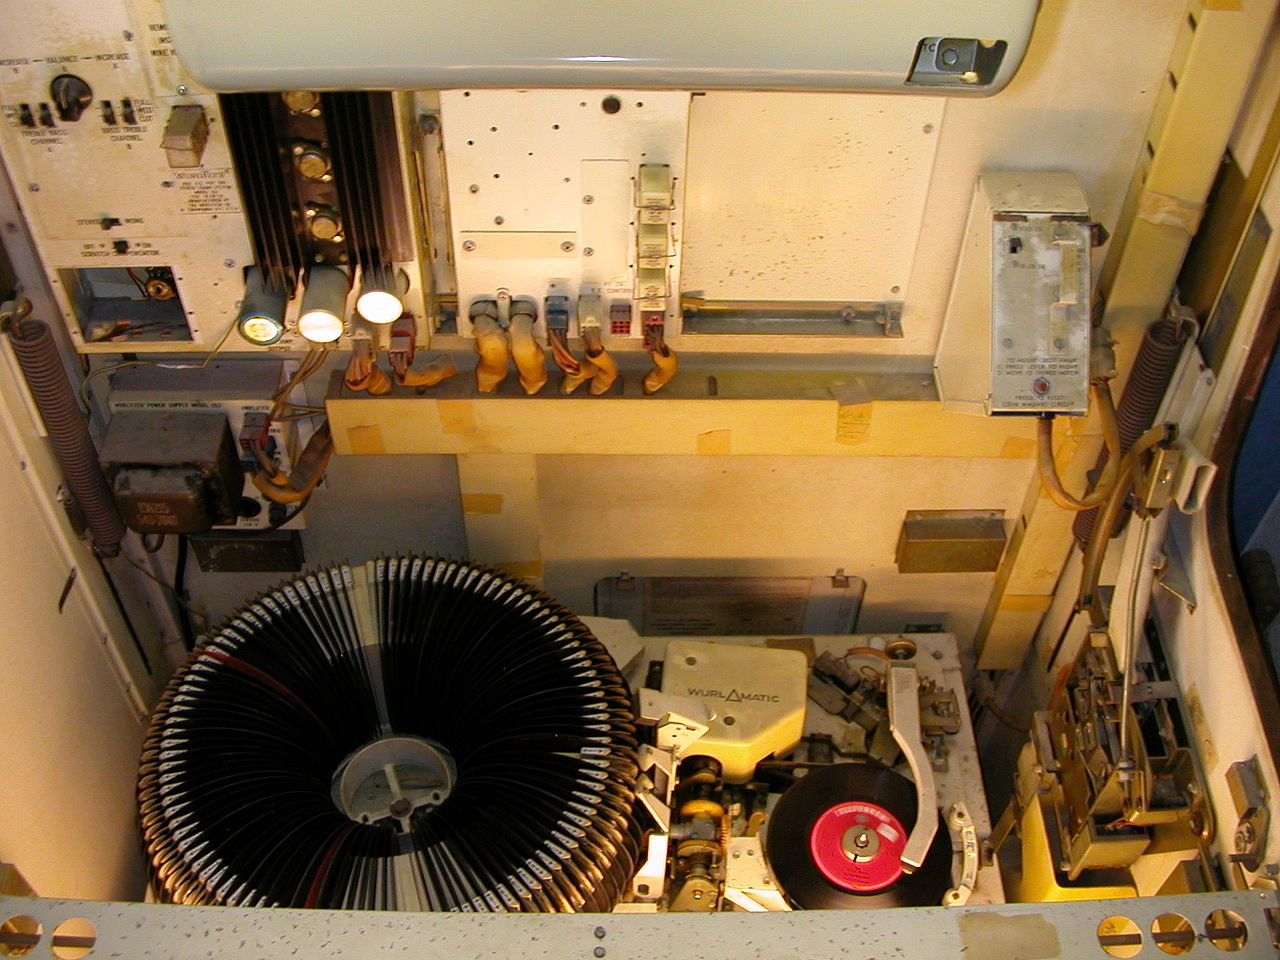 Quality Jukebox repair on both vintage and modern units